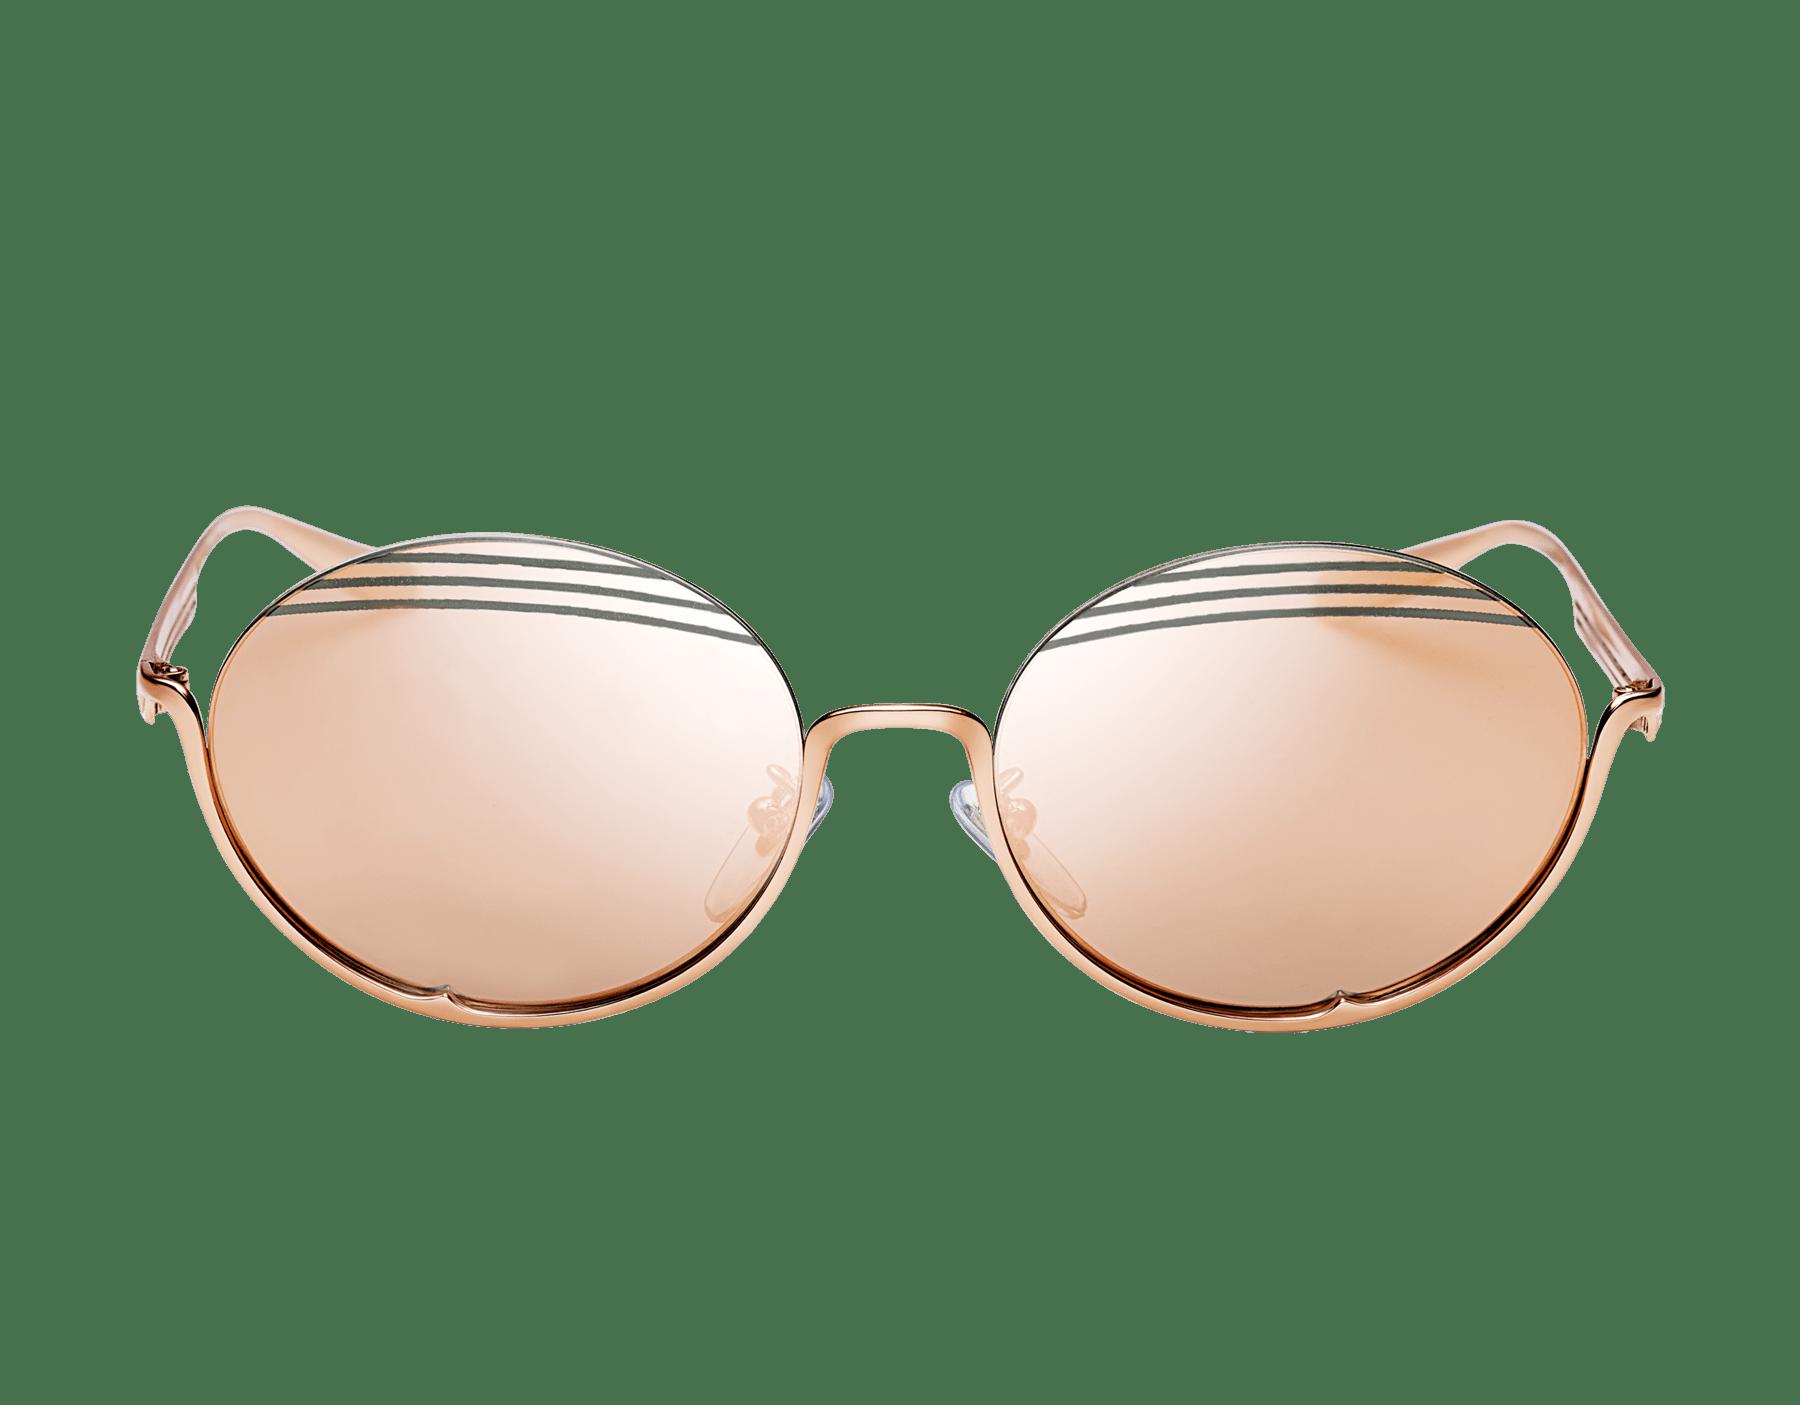 Bvlgari B.zero1 B.stripe semi-rimless oval metal sunglasses. 903713 image 2